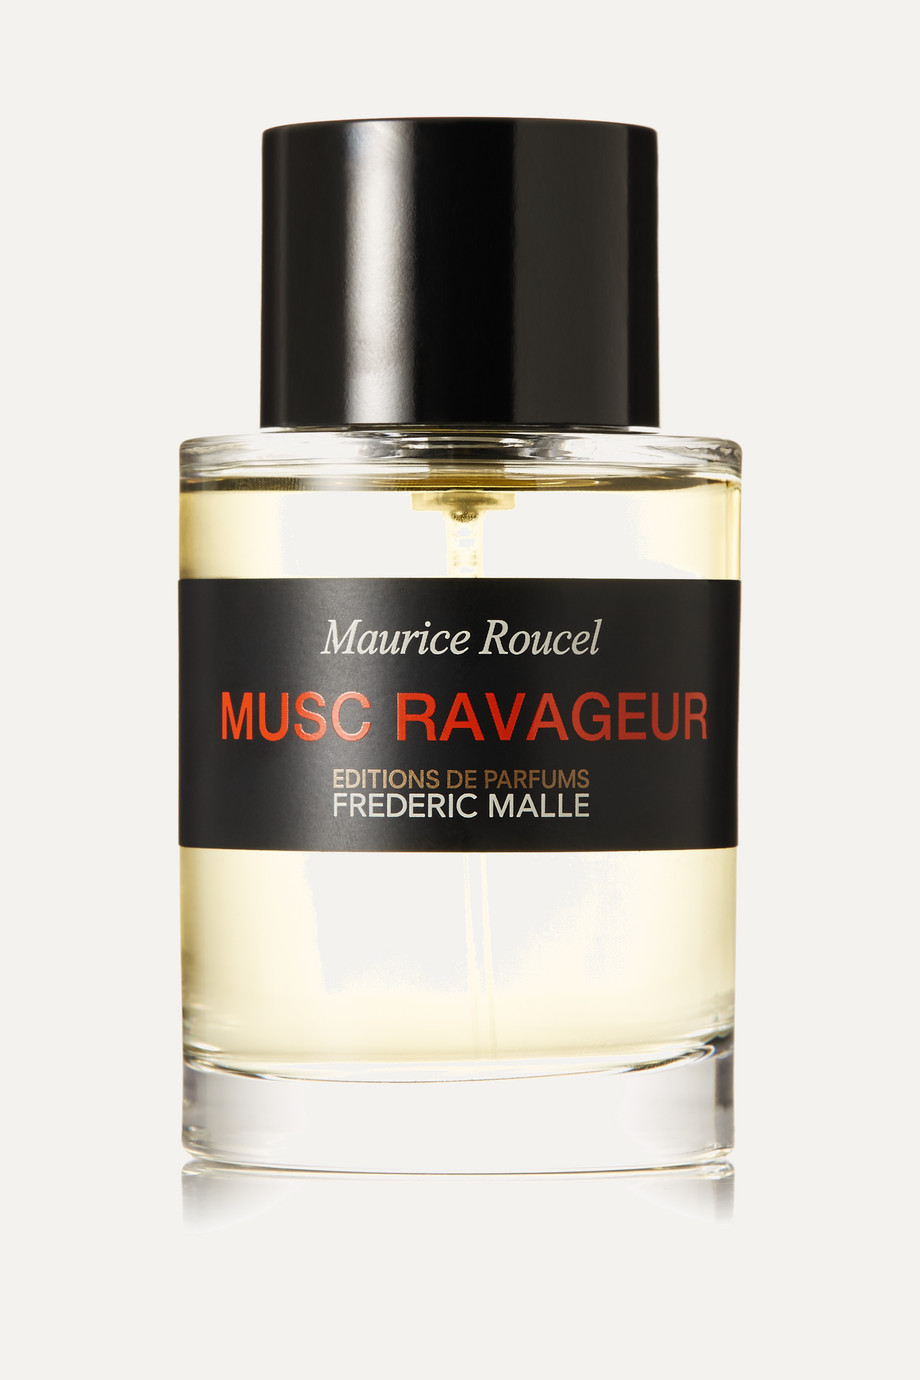 Frederic Malle Musc Ravageur Eau de Parfum - Musk & Amber, 100ml